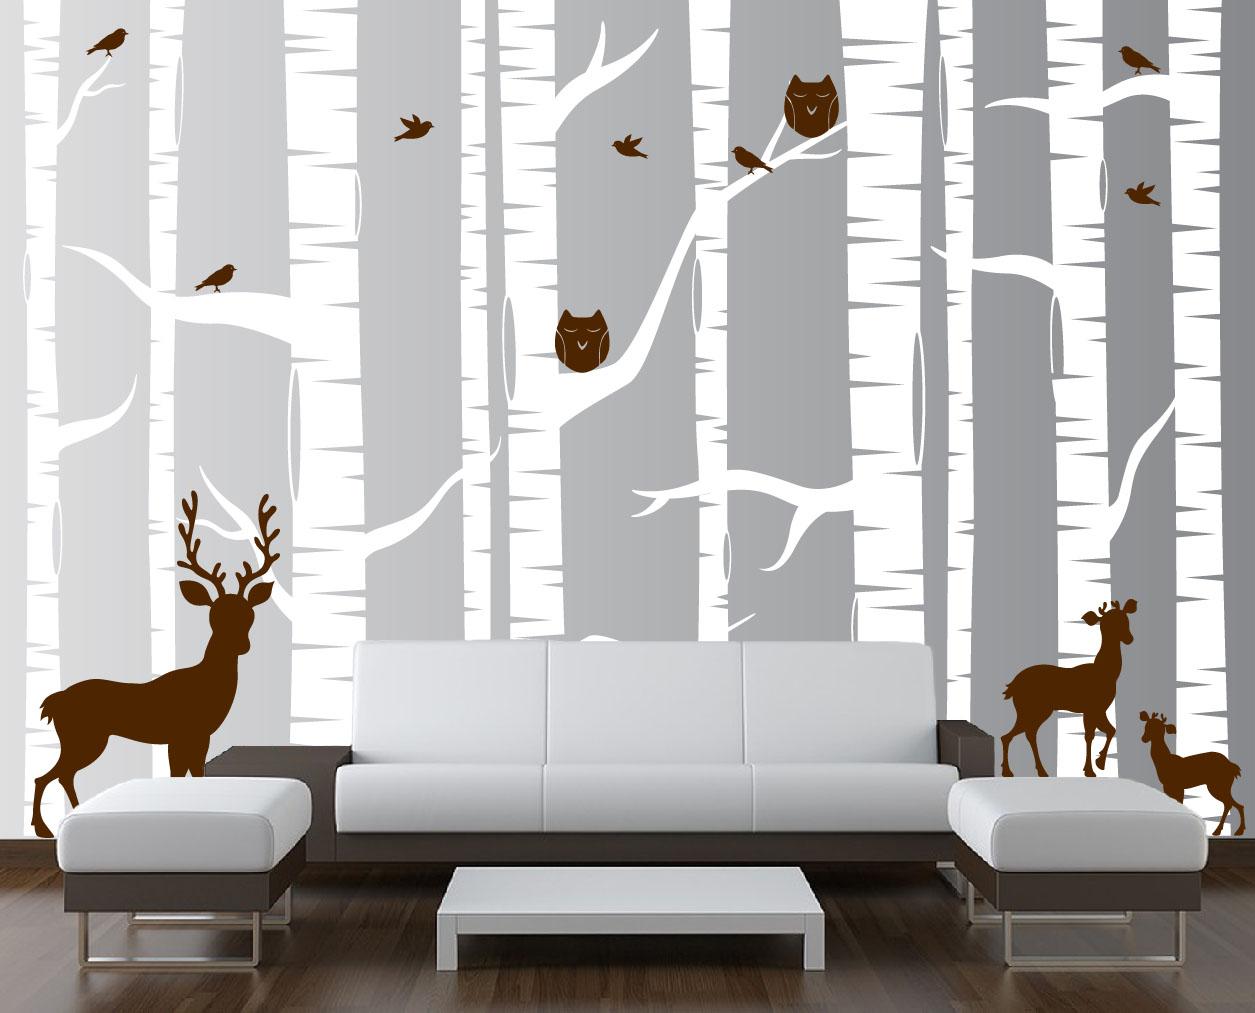 birch-tree-wall-decal-white-woodland-1323.jpg & Birch Tree Forest Set Vinyl Wall Decal Owls Deer #1323 ...